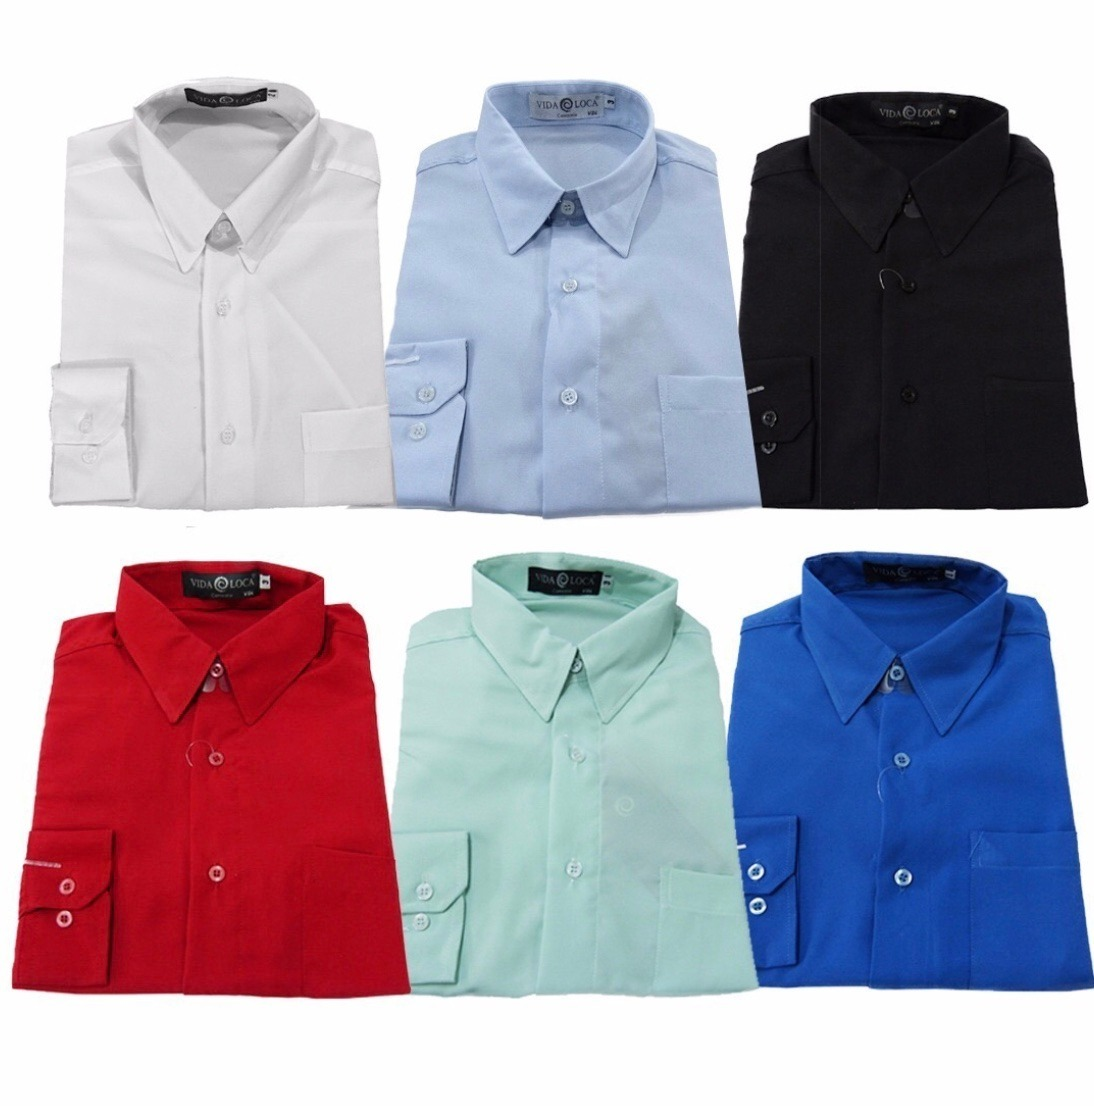 6ff7e47fae camisa social masculina manga longa trabalho uniforme loja. Carregando zoom.